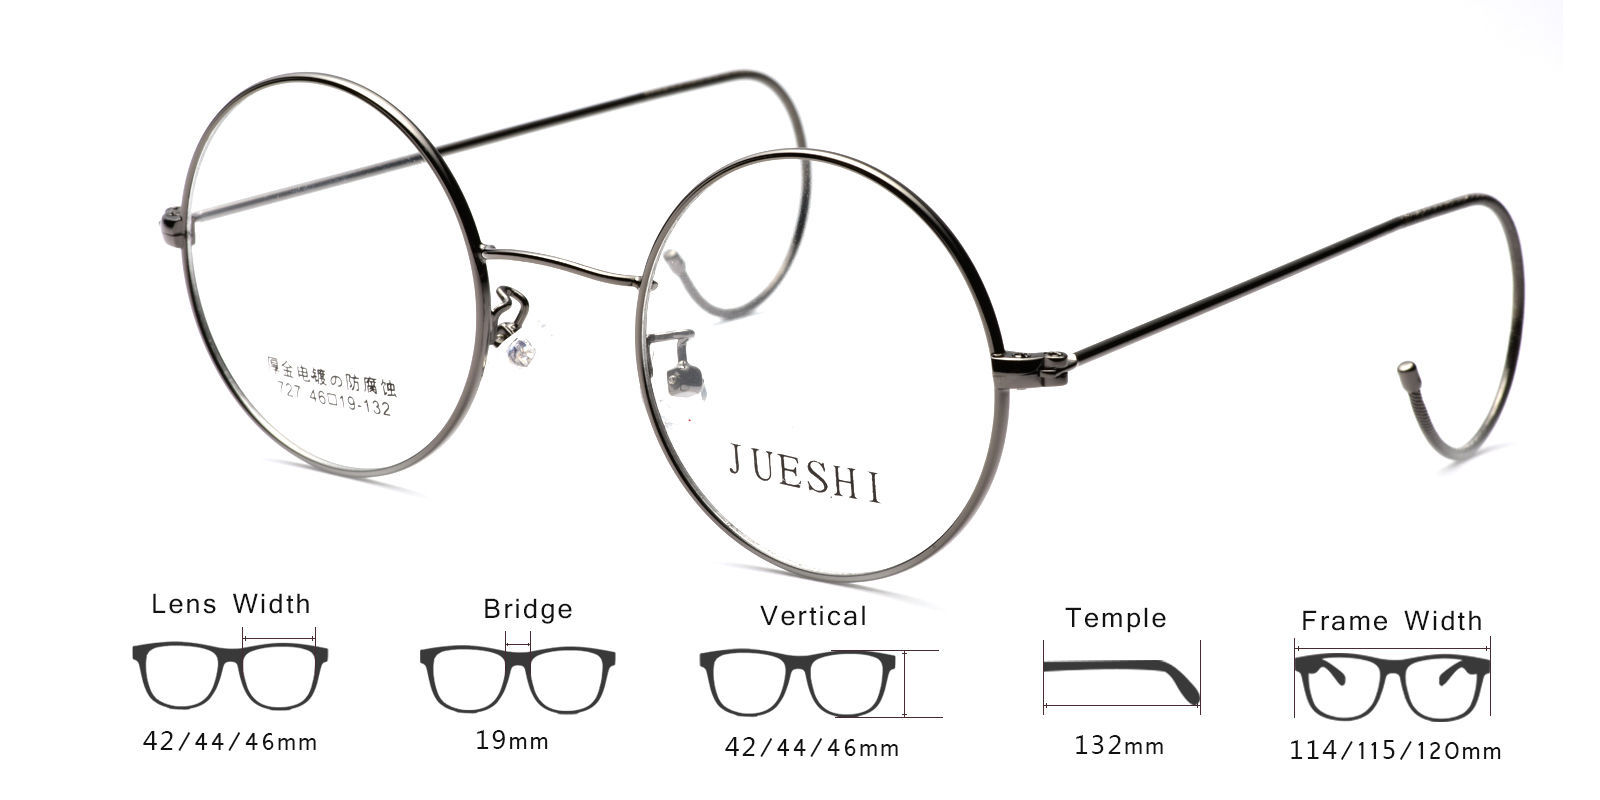 c024f6c5fa8 Vintage Cable Temple Round Eyeglass Frames Spectacles Rx Retro Mens Womens  Kids - Eyeglass Frames